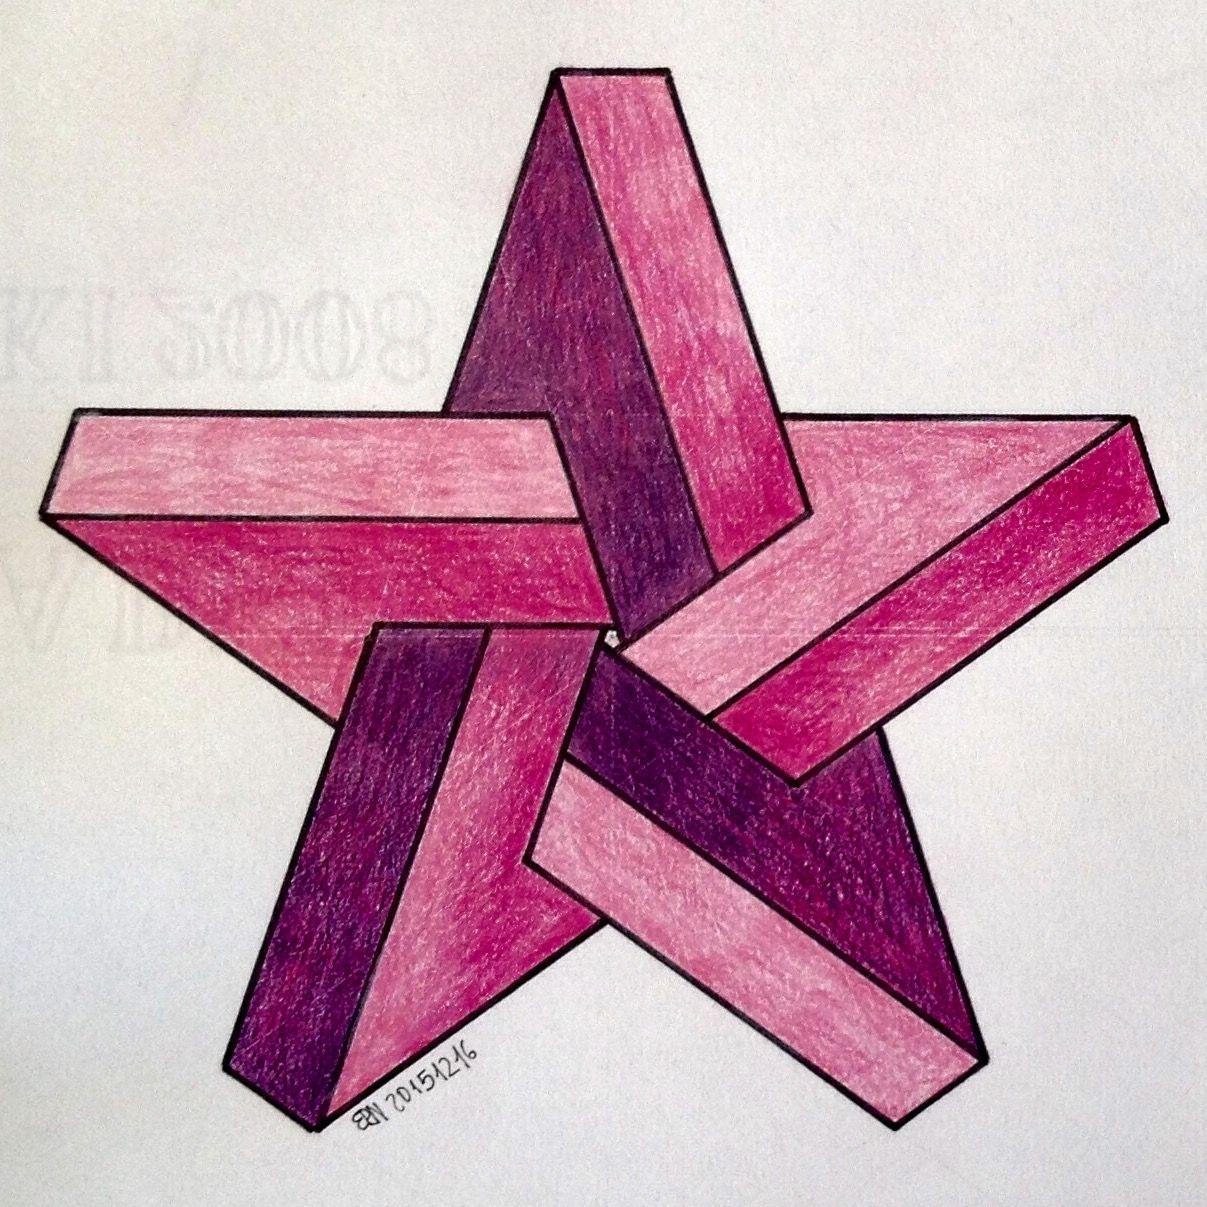 Desenho Geometrico, Ideias